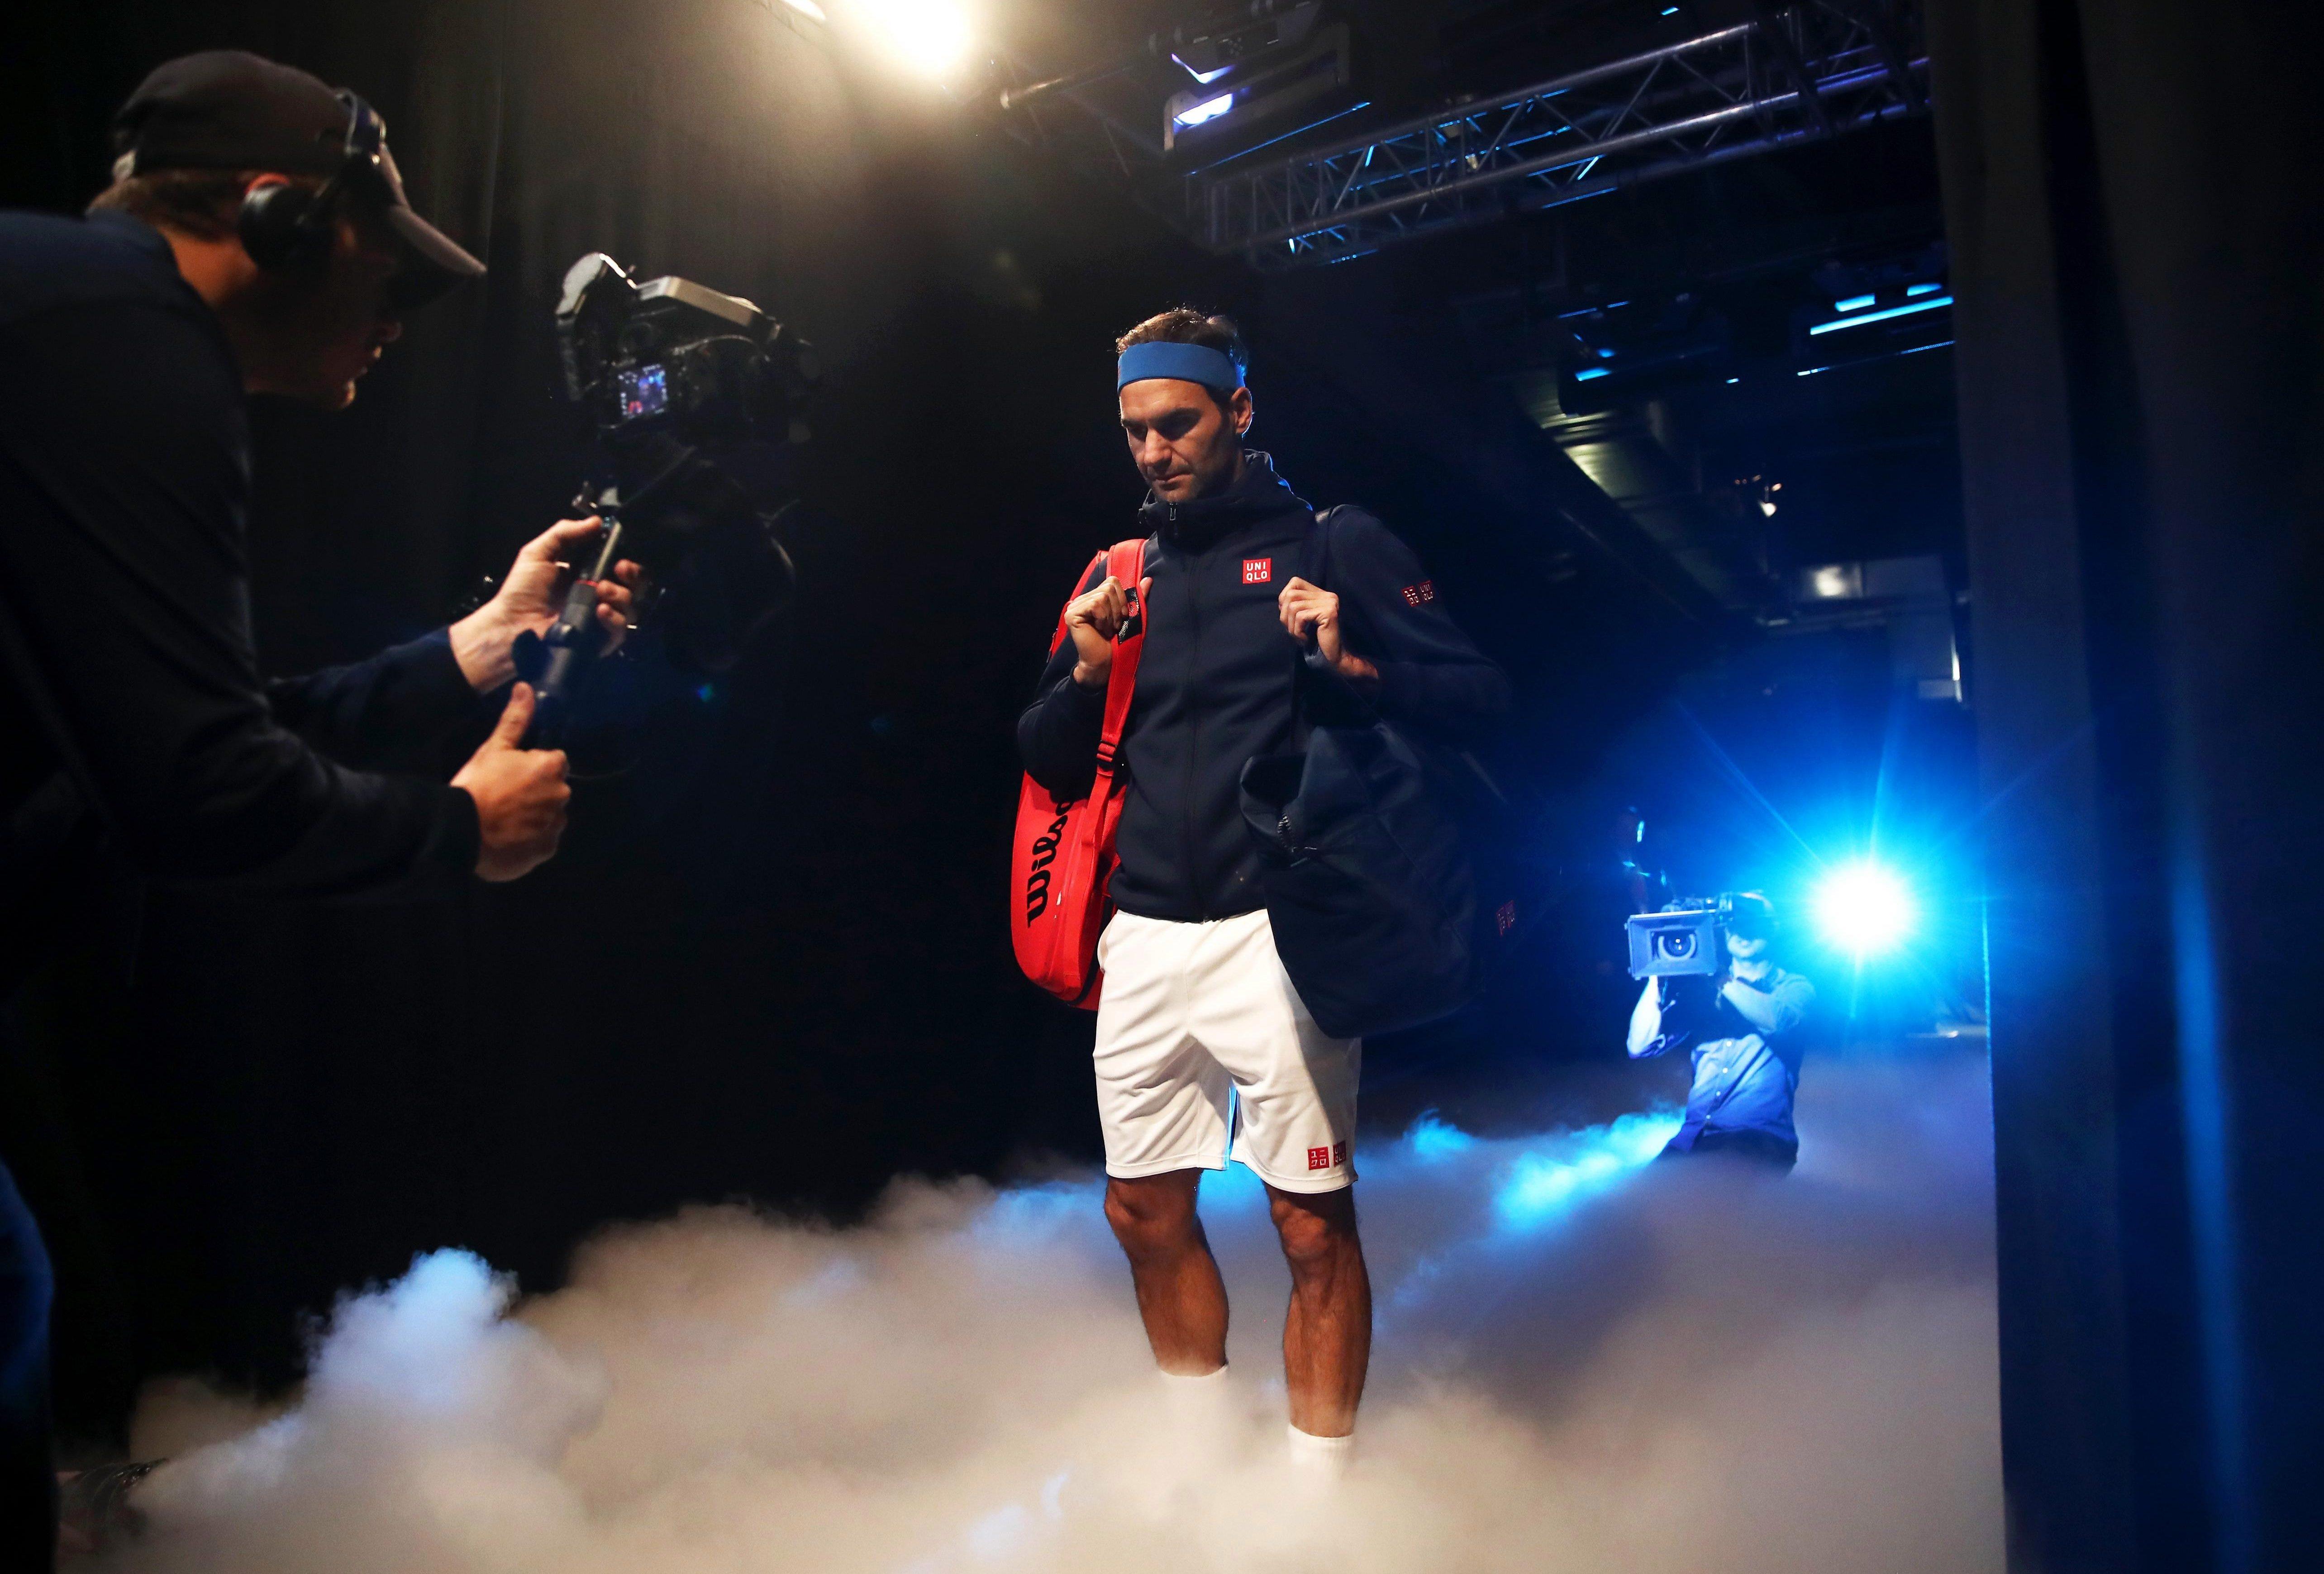 Federer topped group Lleyton Hewitt despite his loss to Kei Nishikori on Sunday